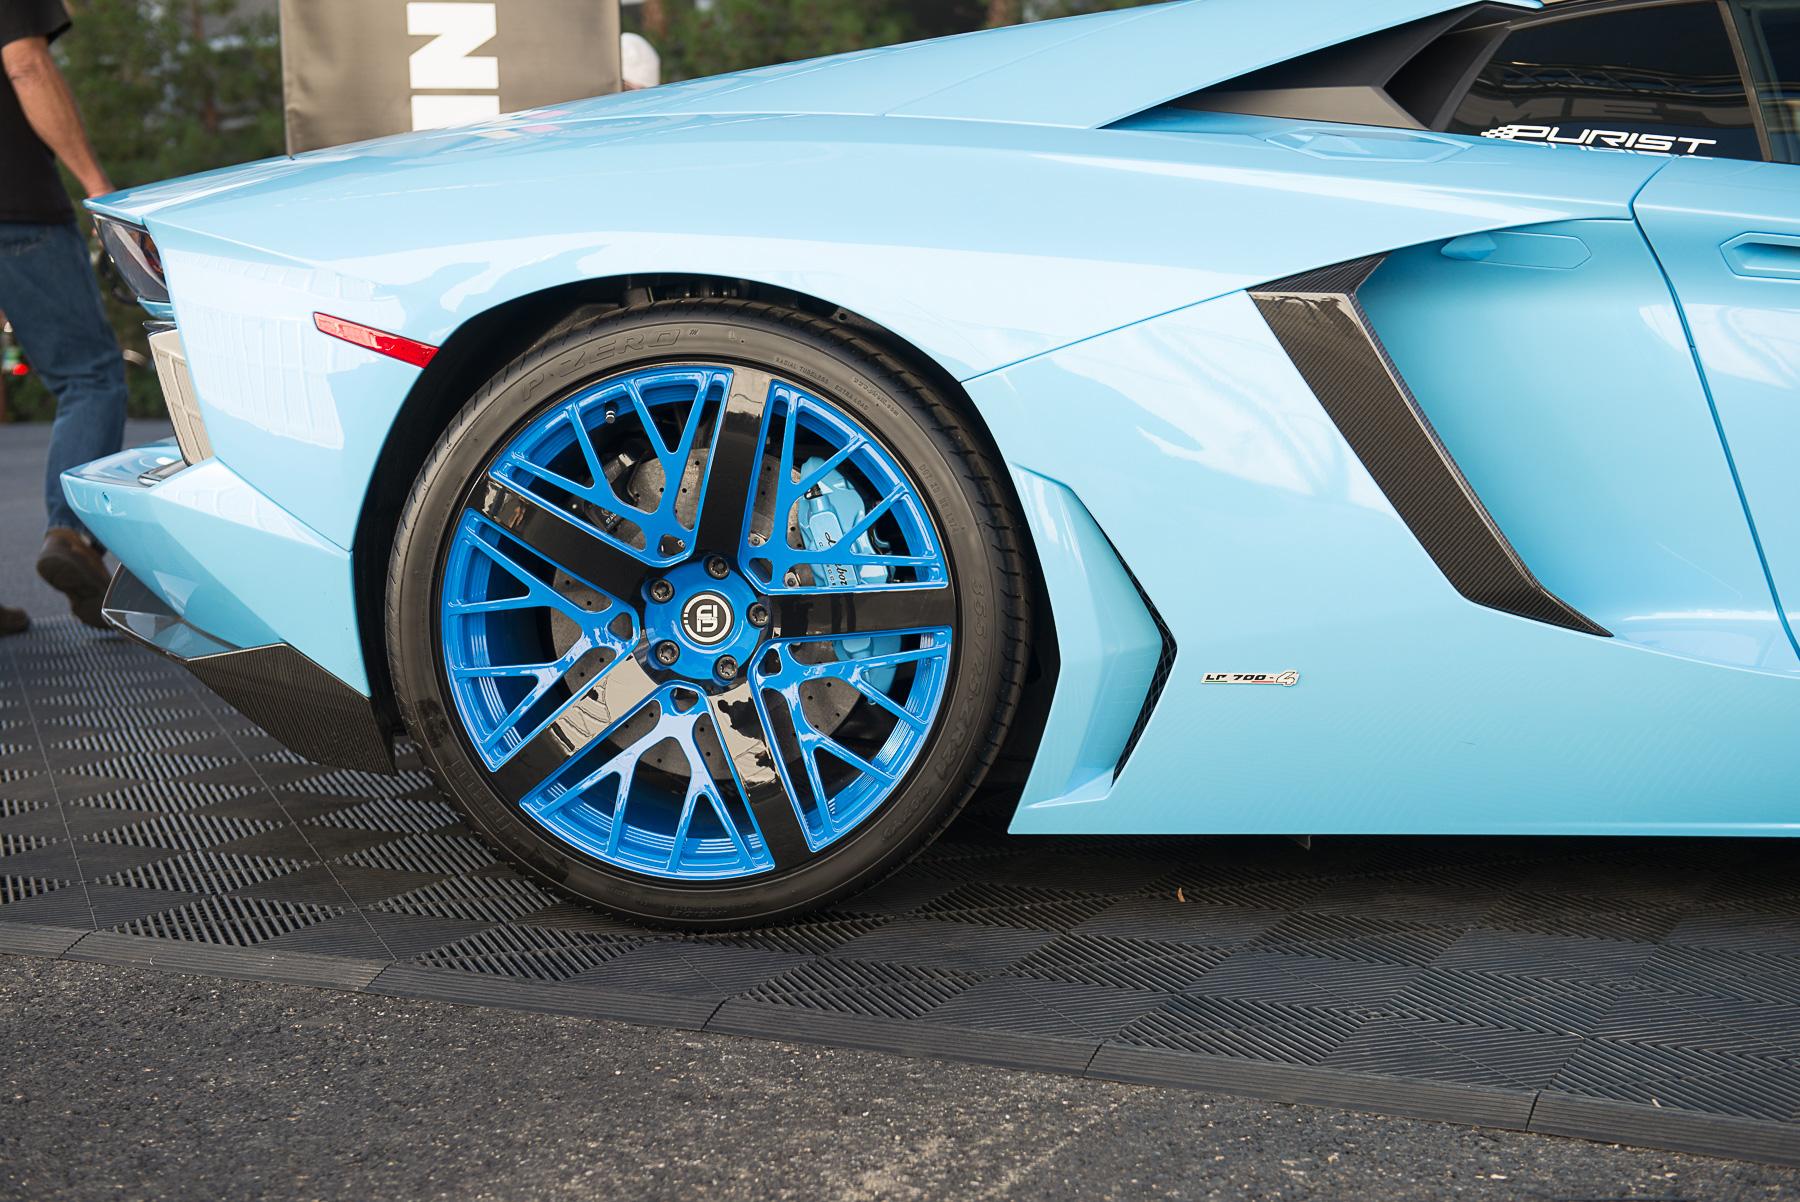 Lamborghini-Aventador-SEMA-2015-Fondmetal-Booth